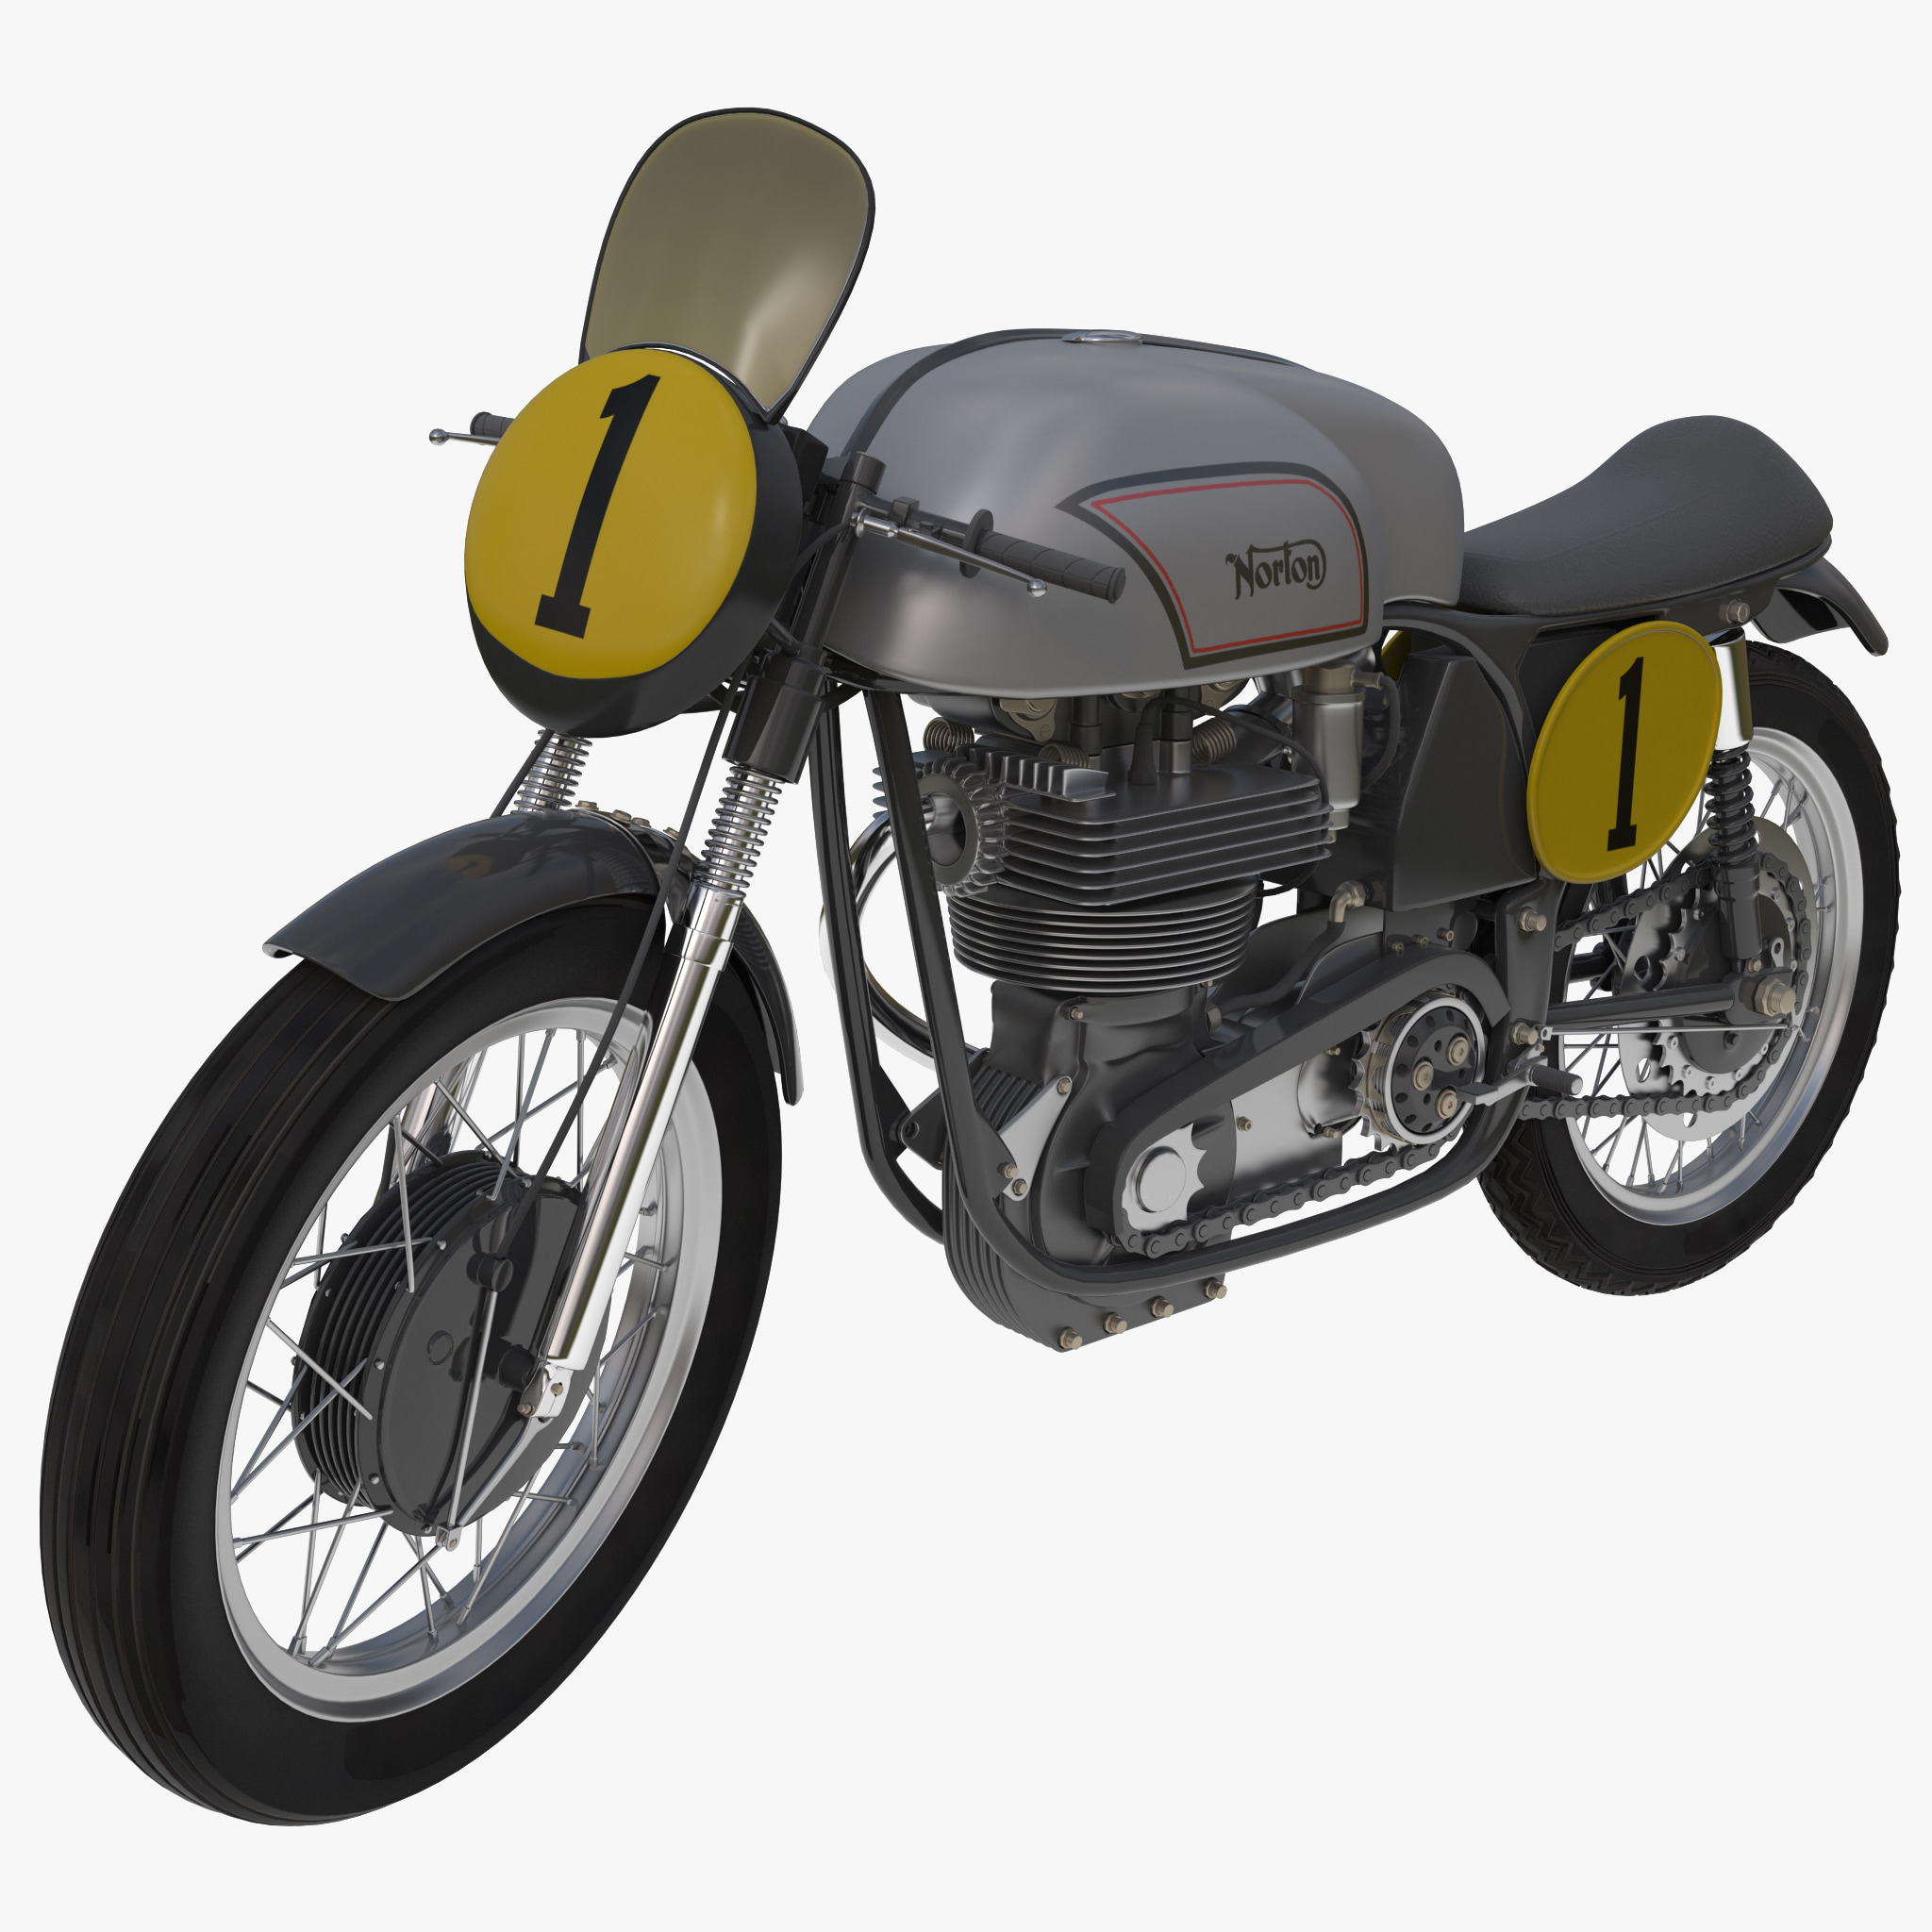 Road Racing Motorcycle Norton Manx Rigged_1.jpg